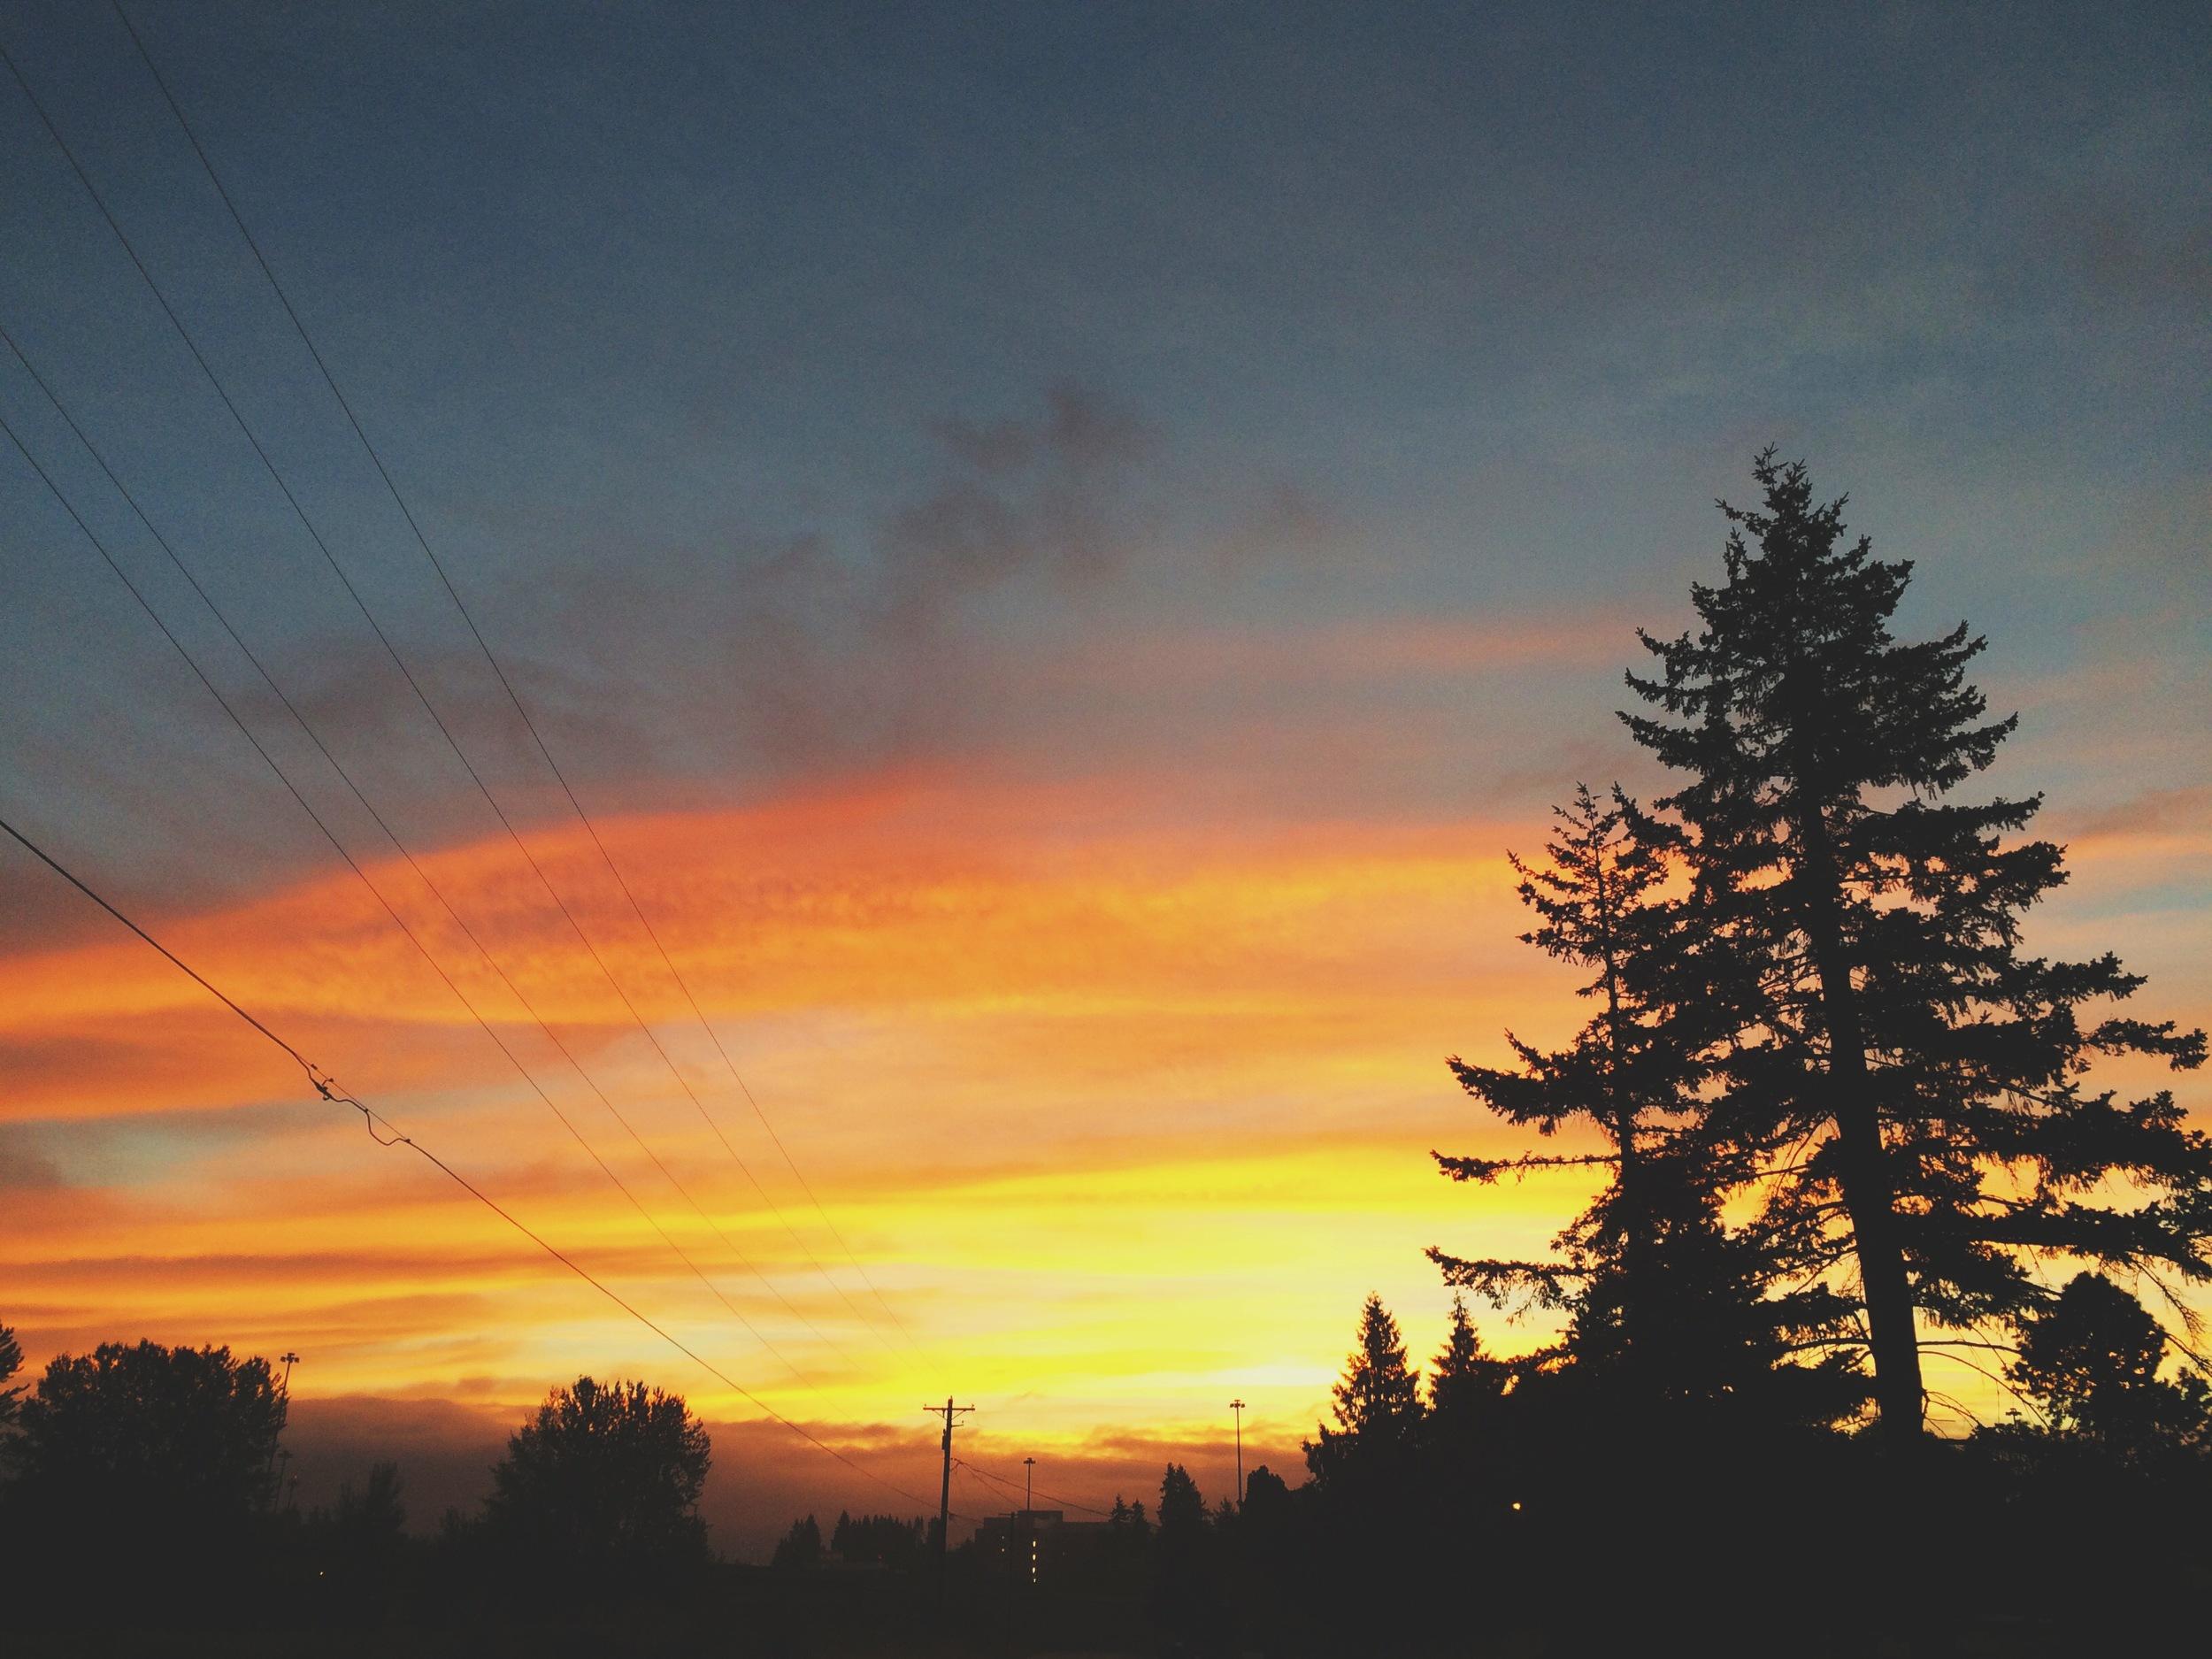 Again, another crazy sunrise in Salmon Creek, WA